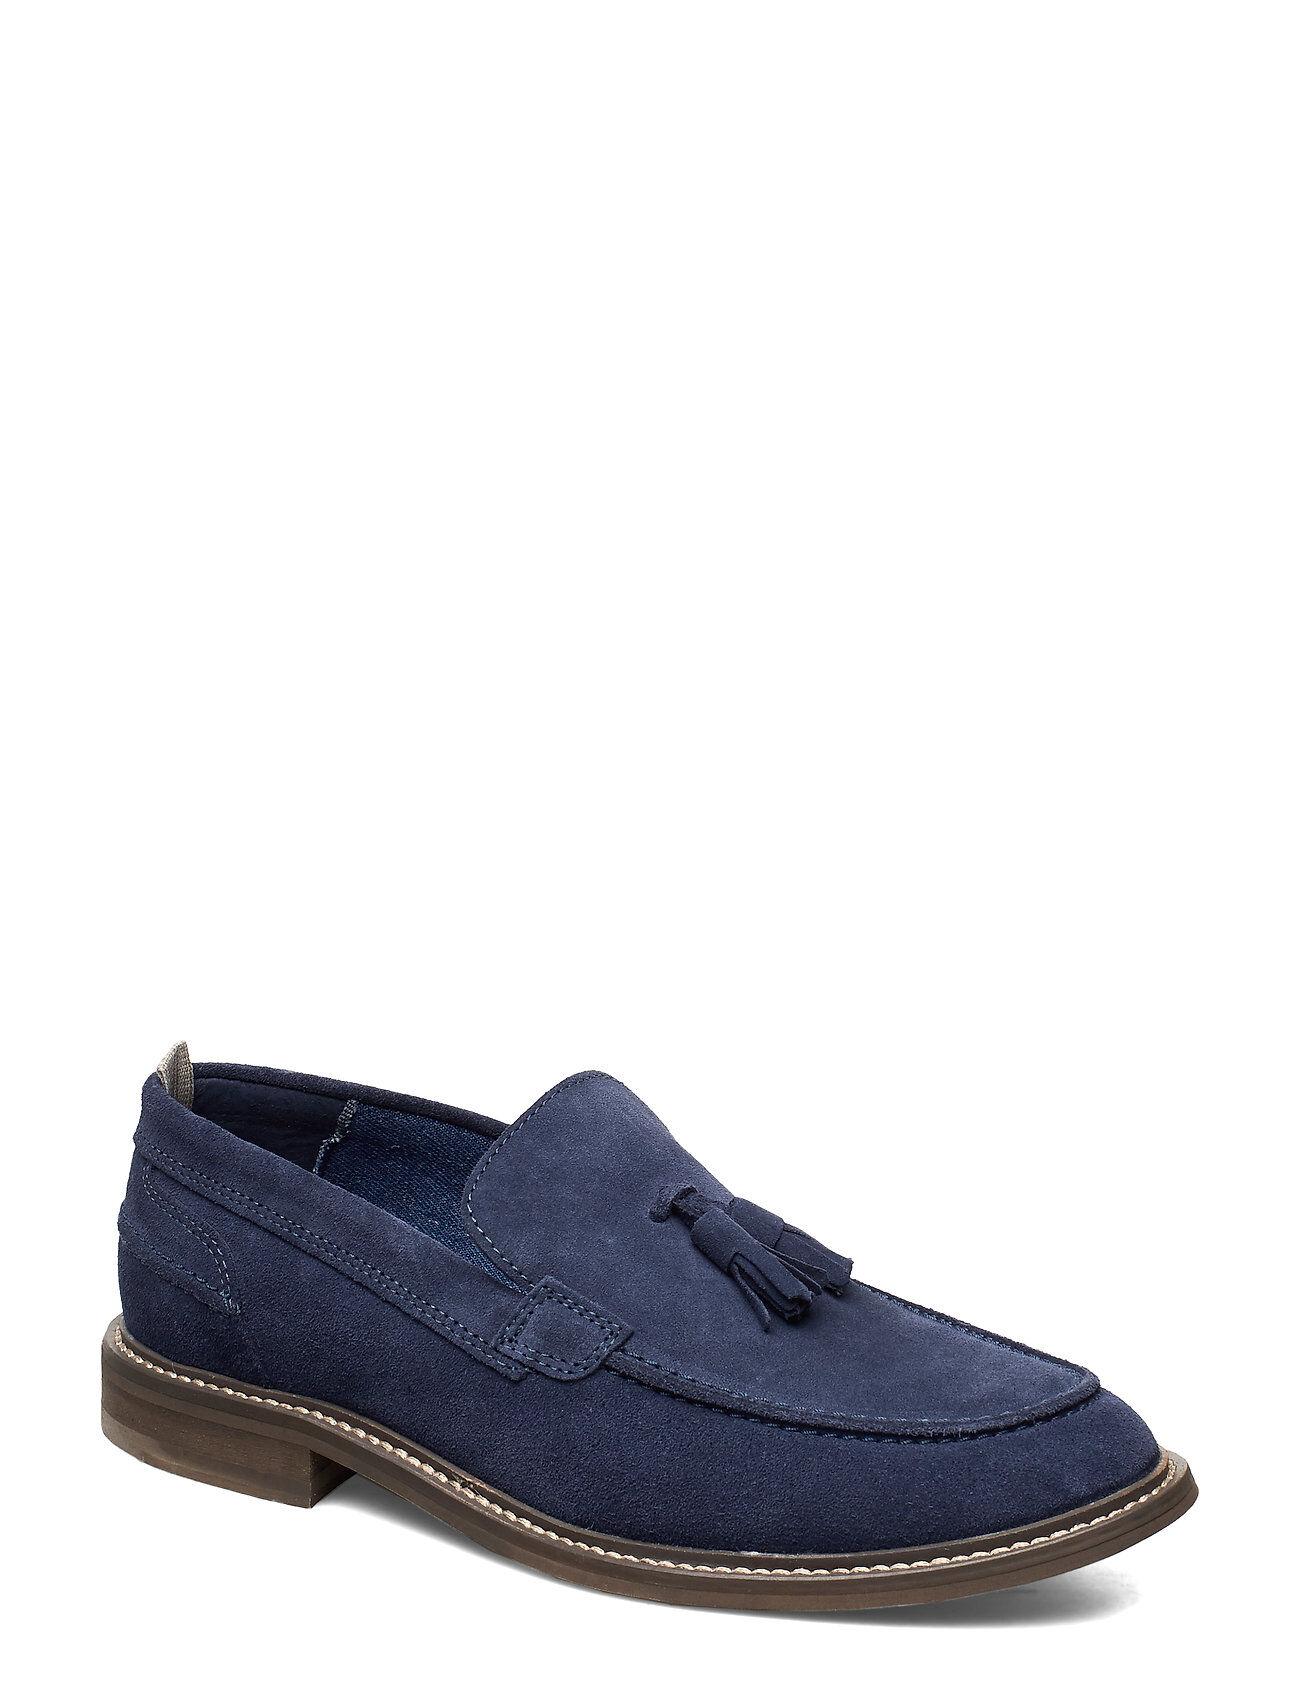 Playboy Footwear Oklahoma Loaferit Matalat Kengät Sininen Playboy Footwear